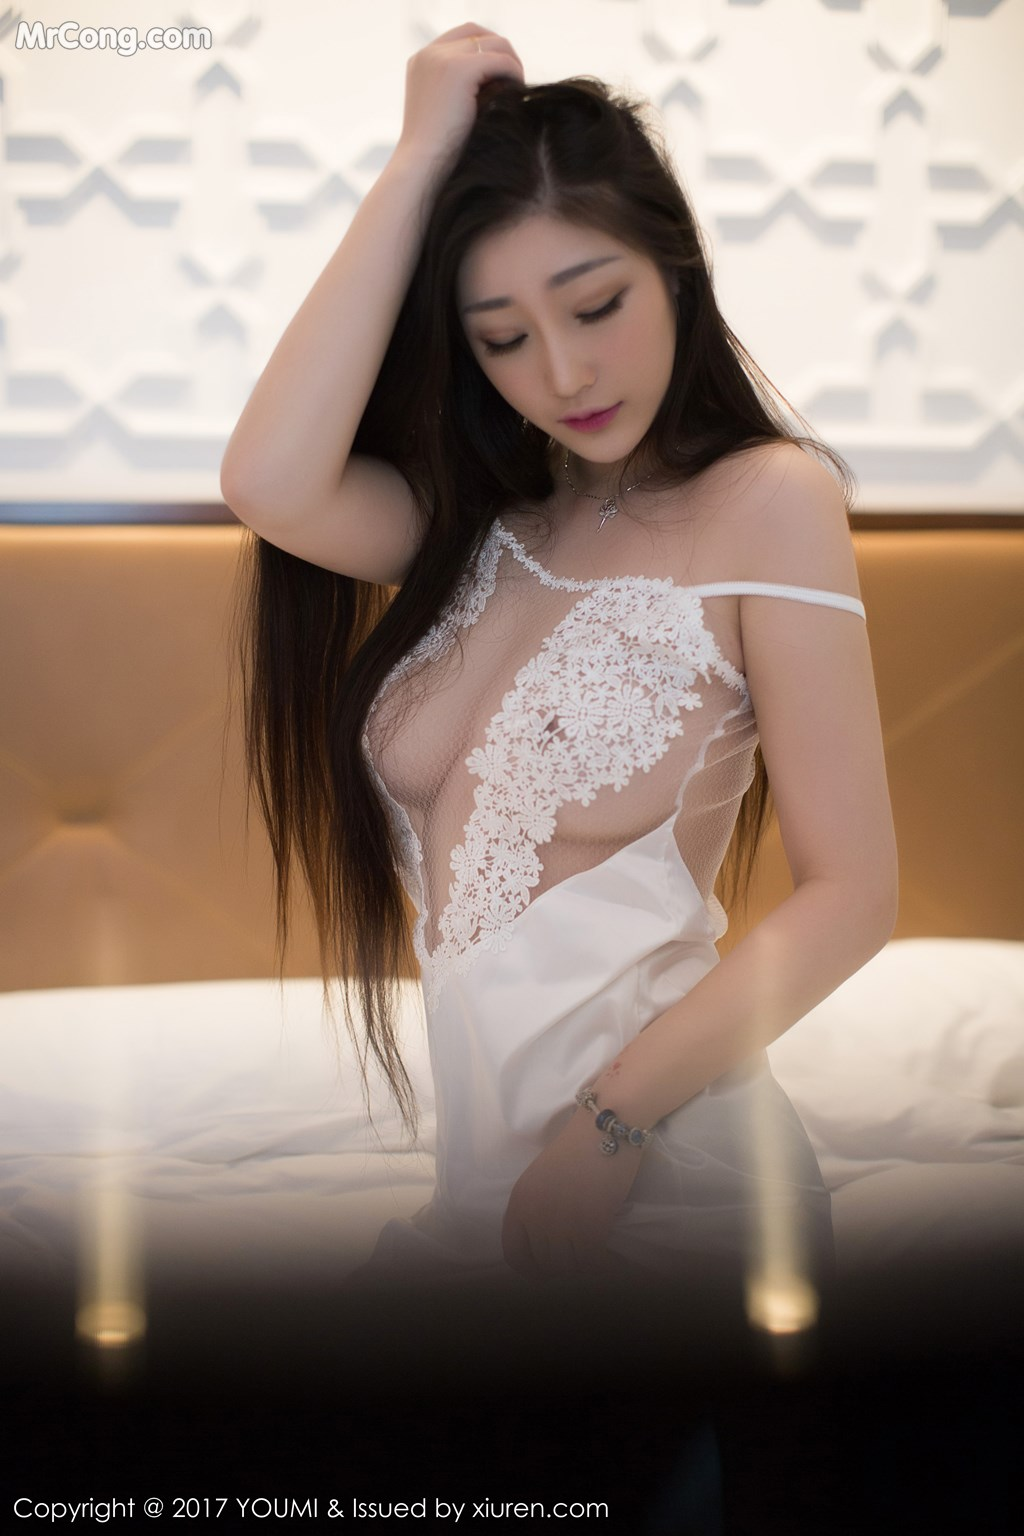 Image YouMi-Vol.077-Daji-Toxic-MrCong.com-028 in post YouMi Vol.077: Người mẫu Daji_Toxic (妲己_Toxic) (49 ảnh)